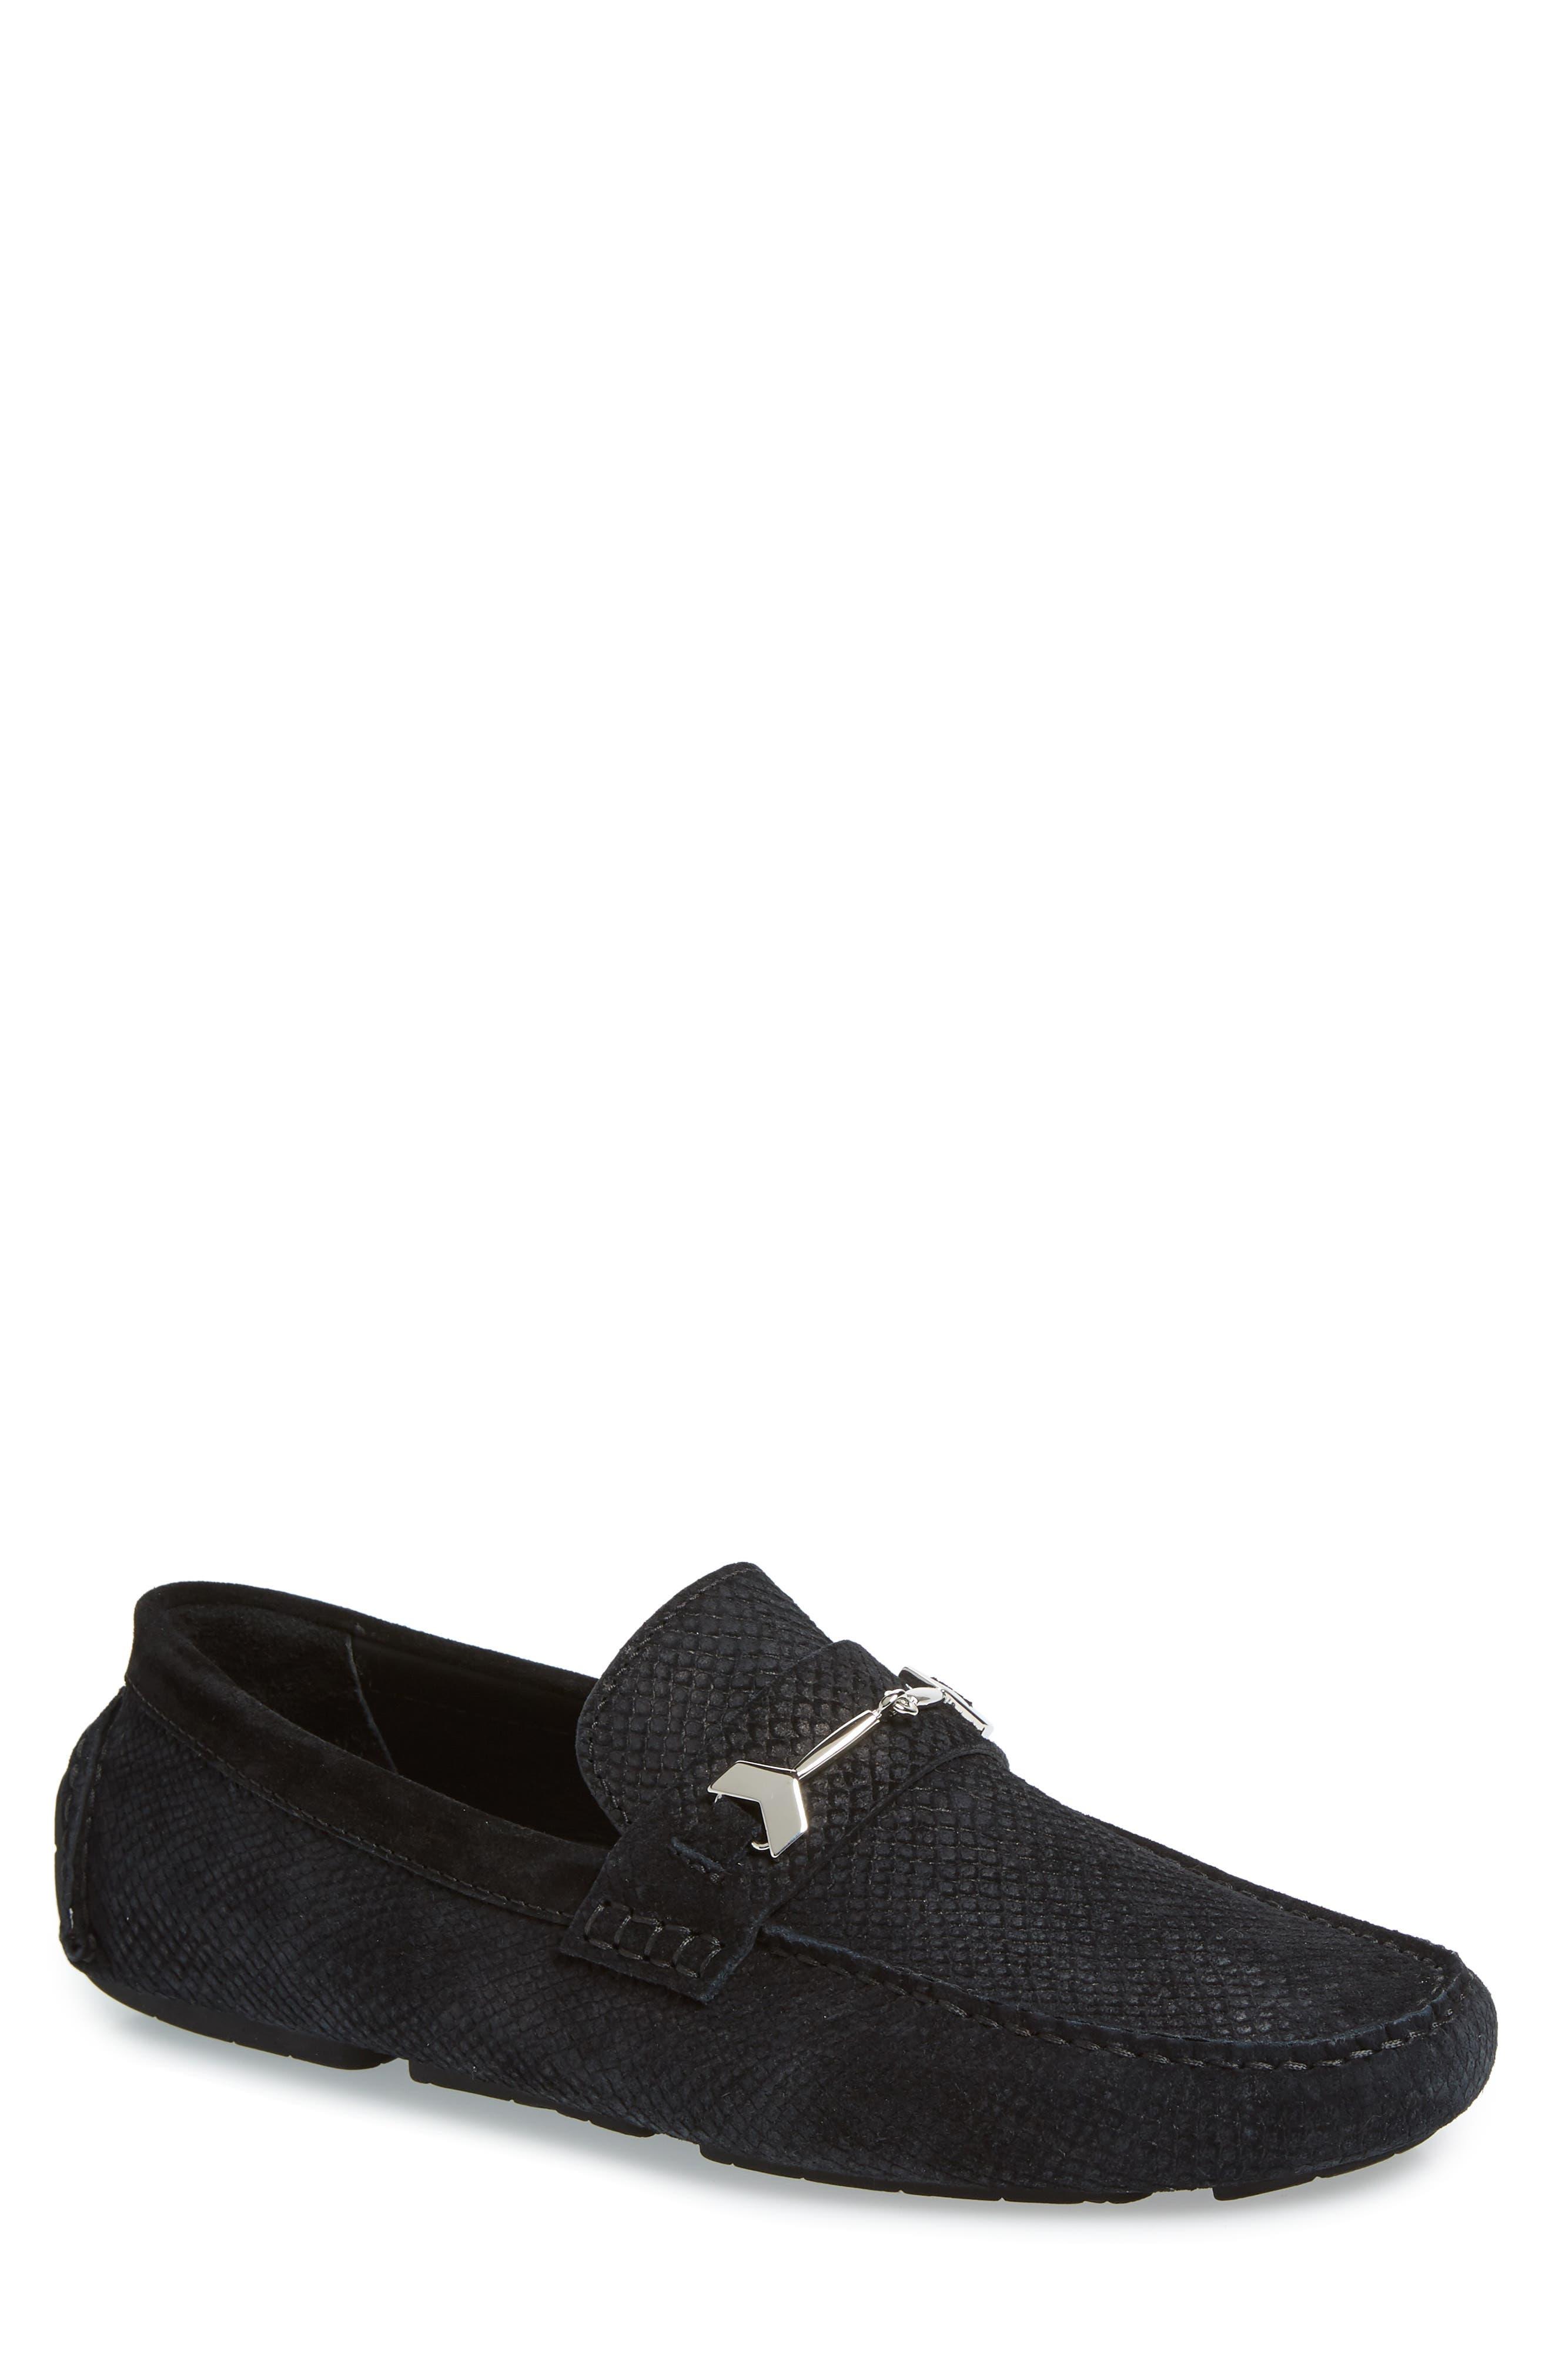 Brewer Croc Textured Driving Loafer,                         Main,                         color, BLACK/BLACK